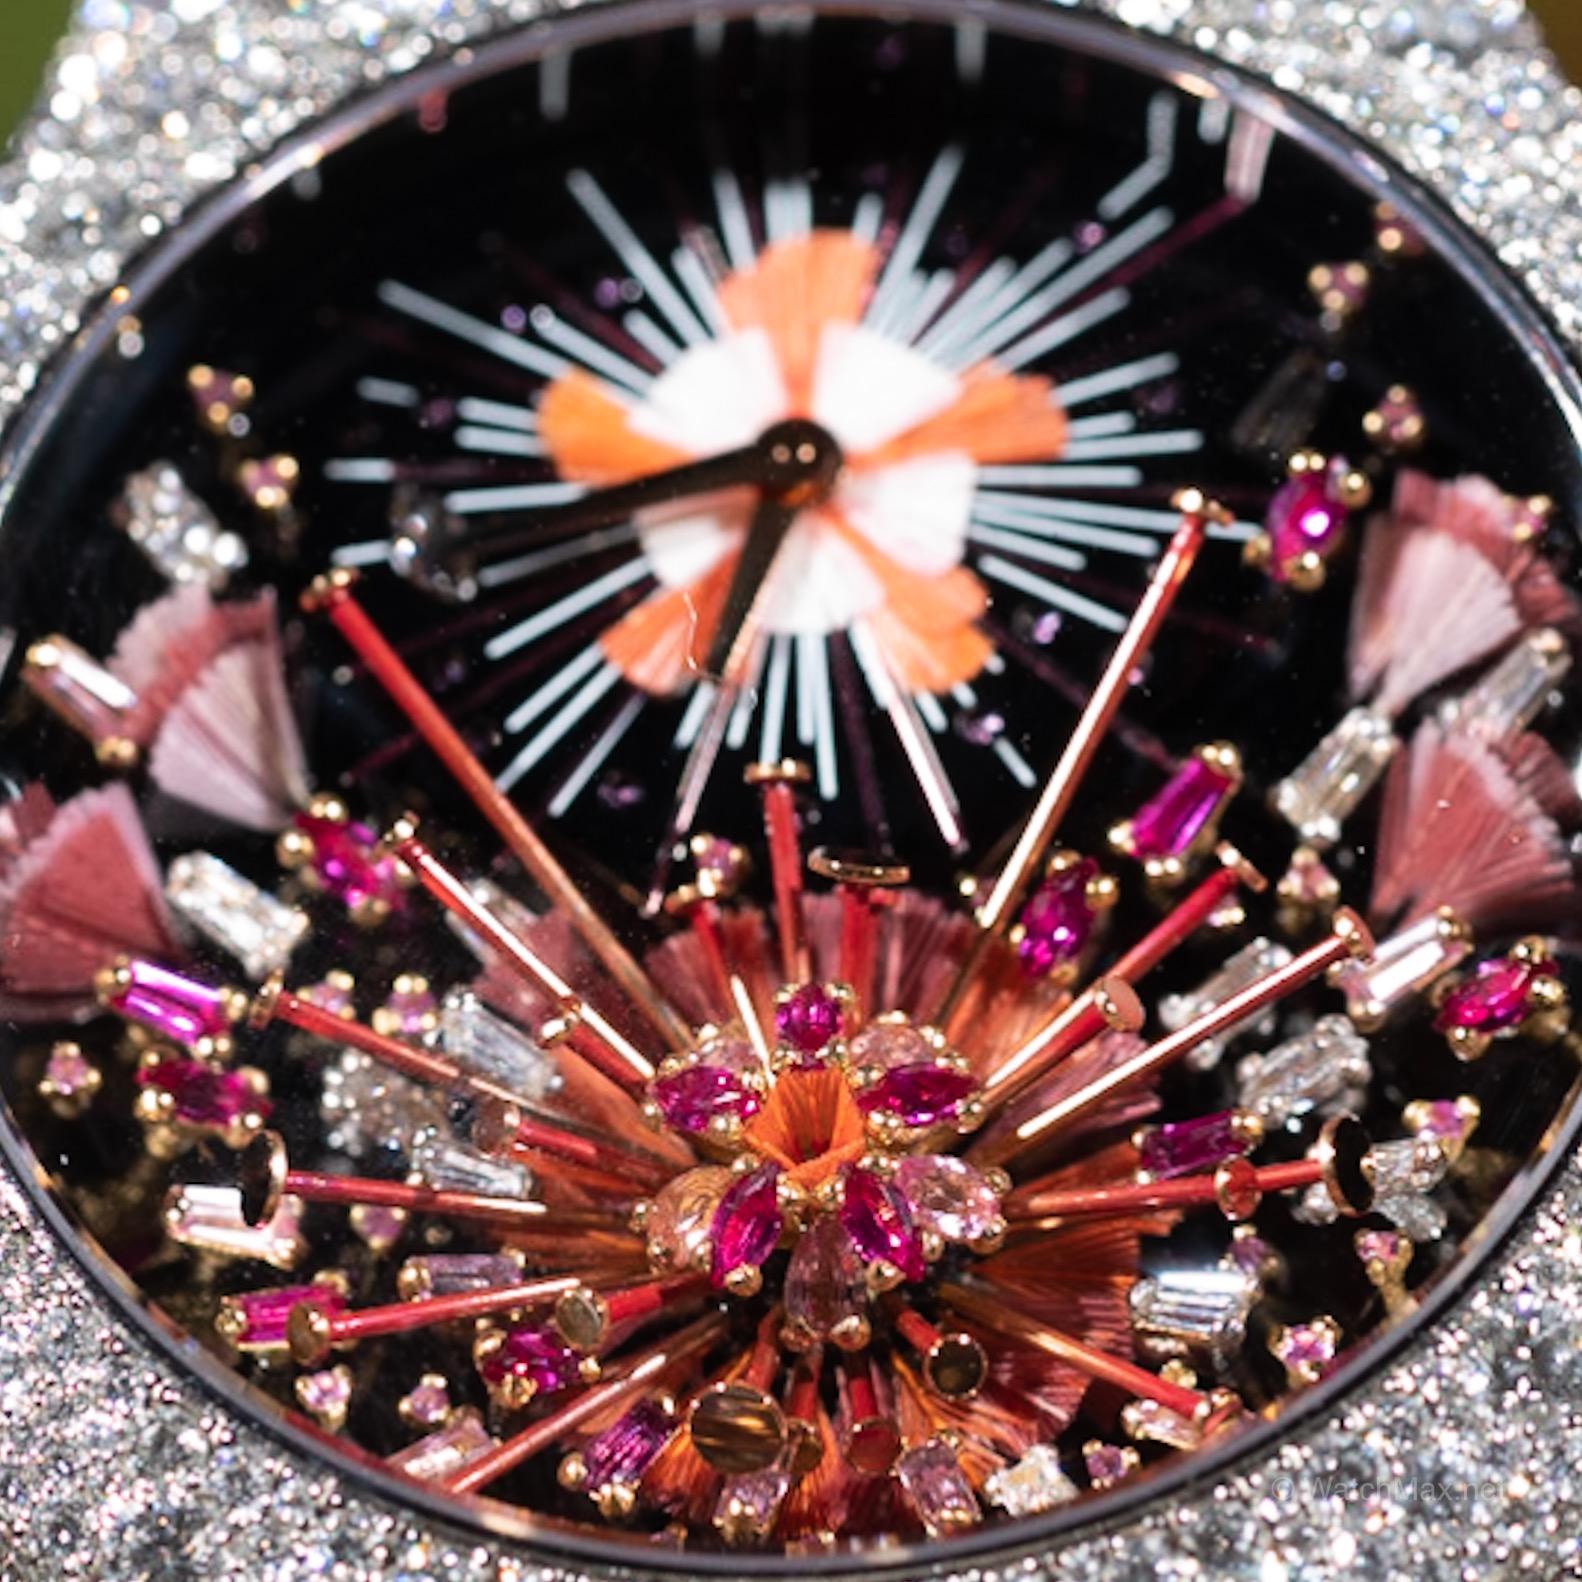 dior-couturetime-2019-7.JPG